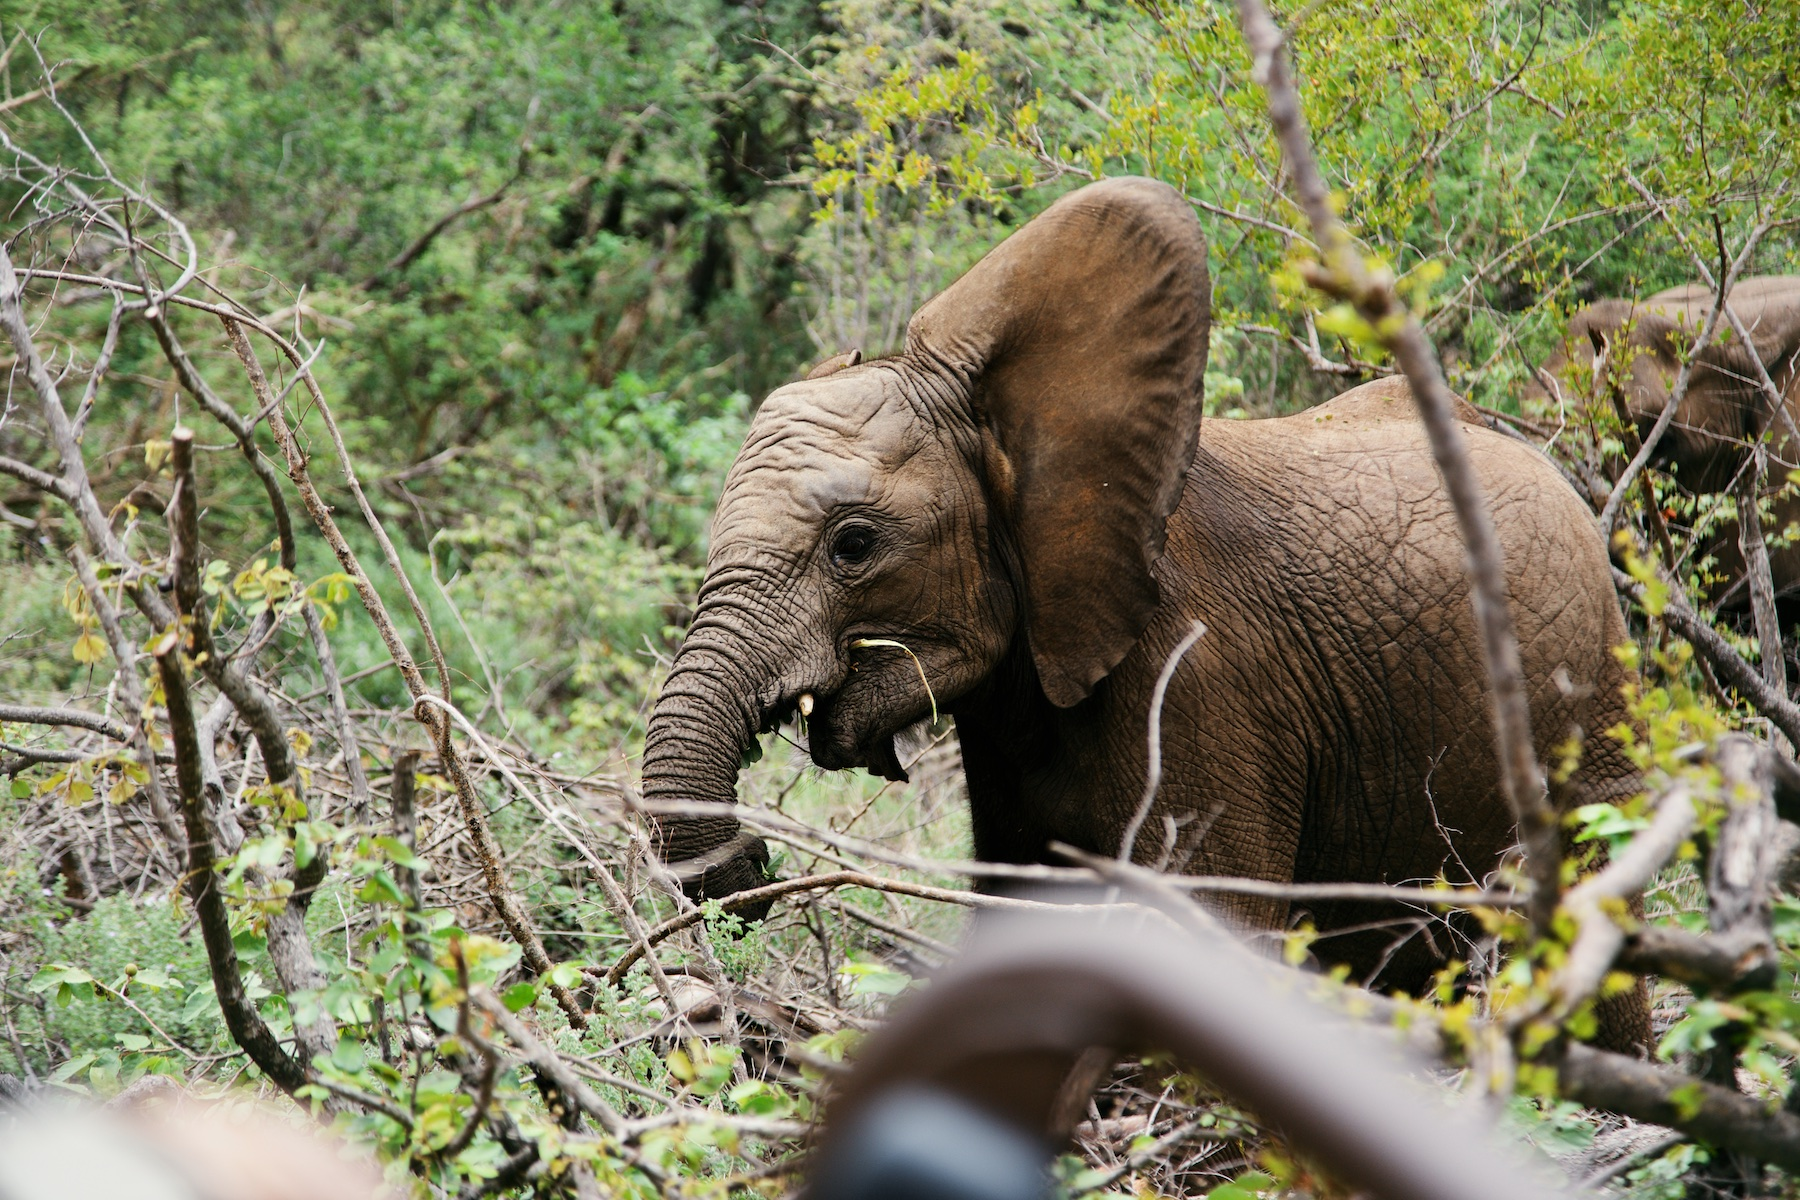 Baby elephant a few meters away... how cute!